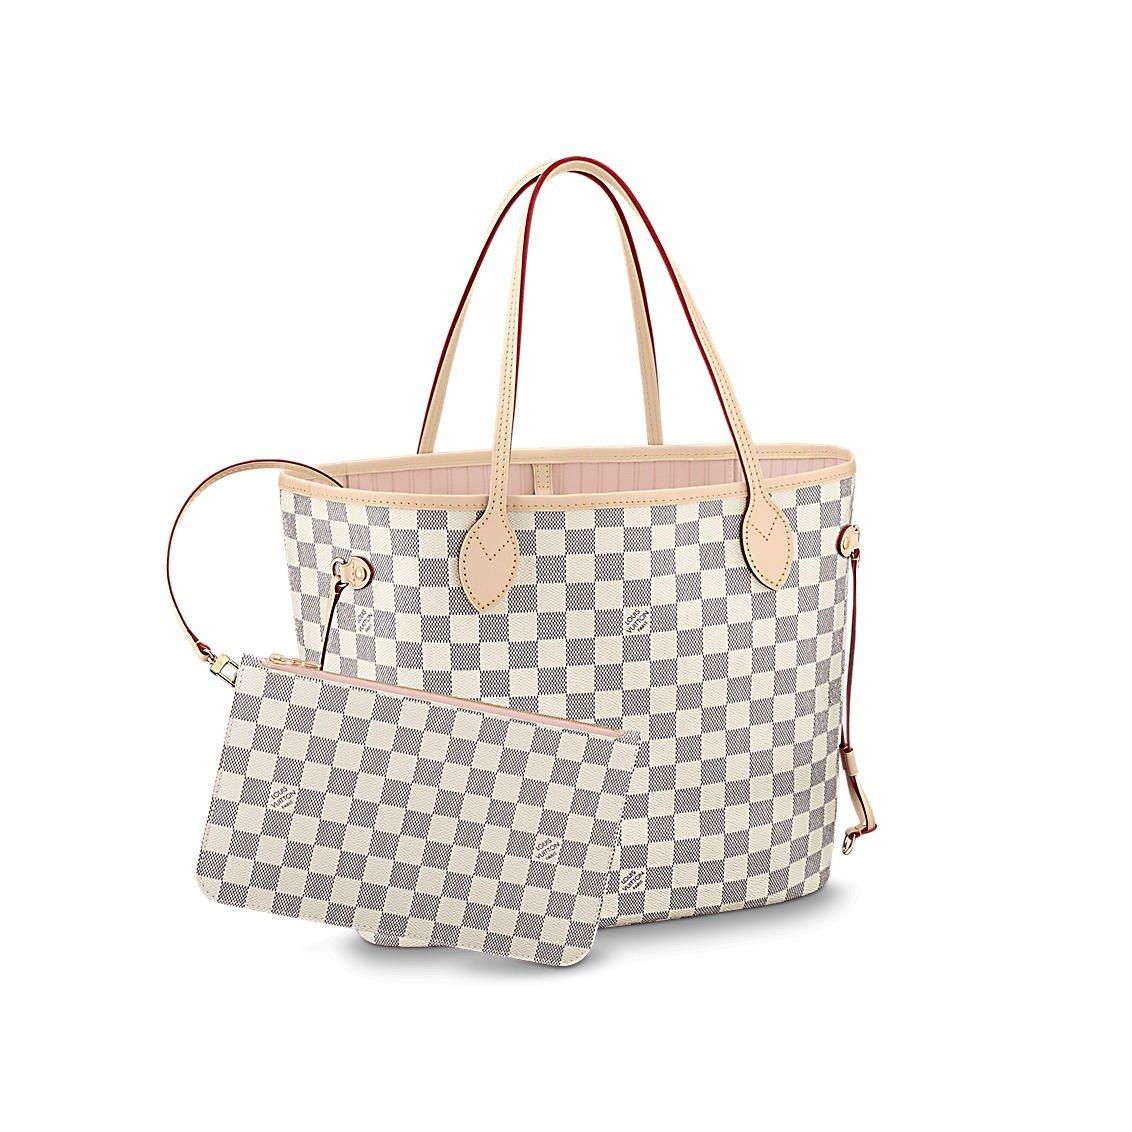 d0f8aea0dd21 Amazon.com  Louis Vuitton Damier Azur Canvas Neverfull MM N41605 Rose  Ballerine  Shoes